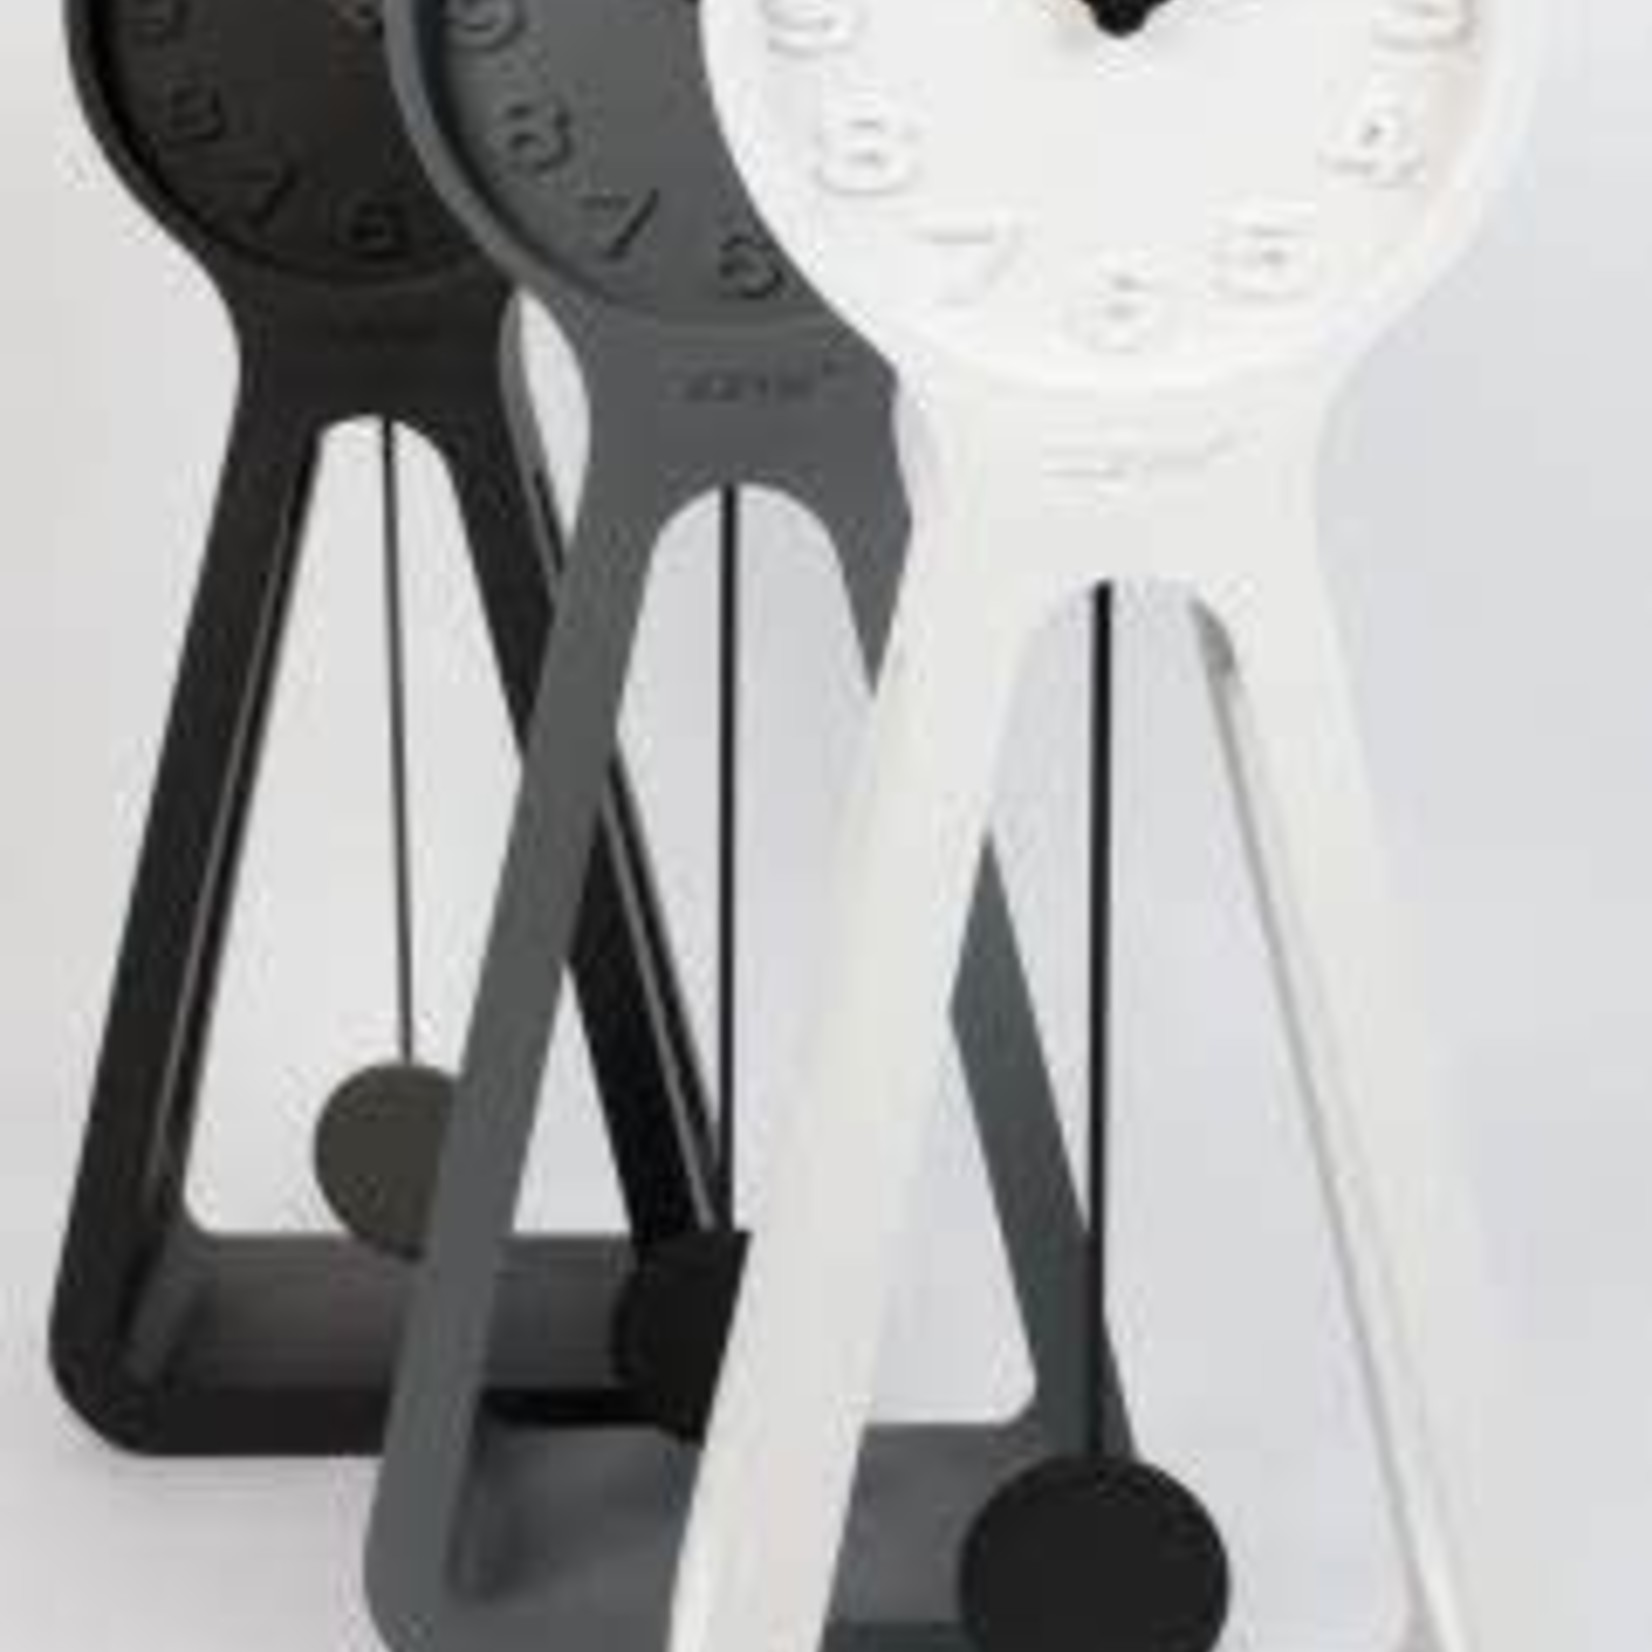 ZUIVER BV Humongous Clock